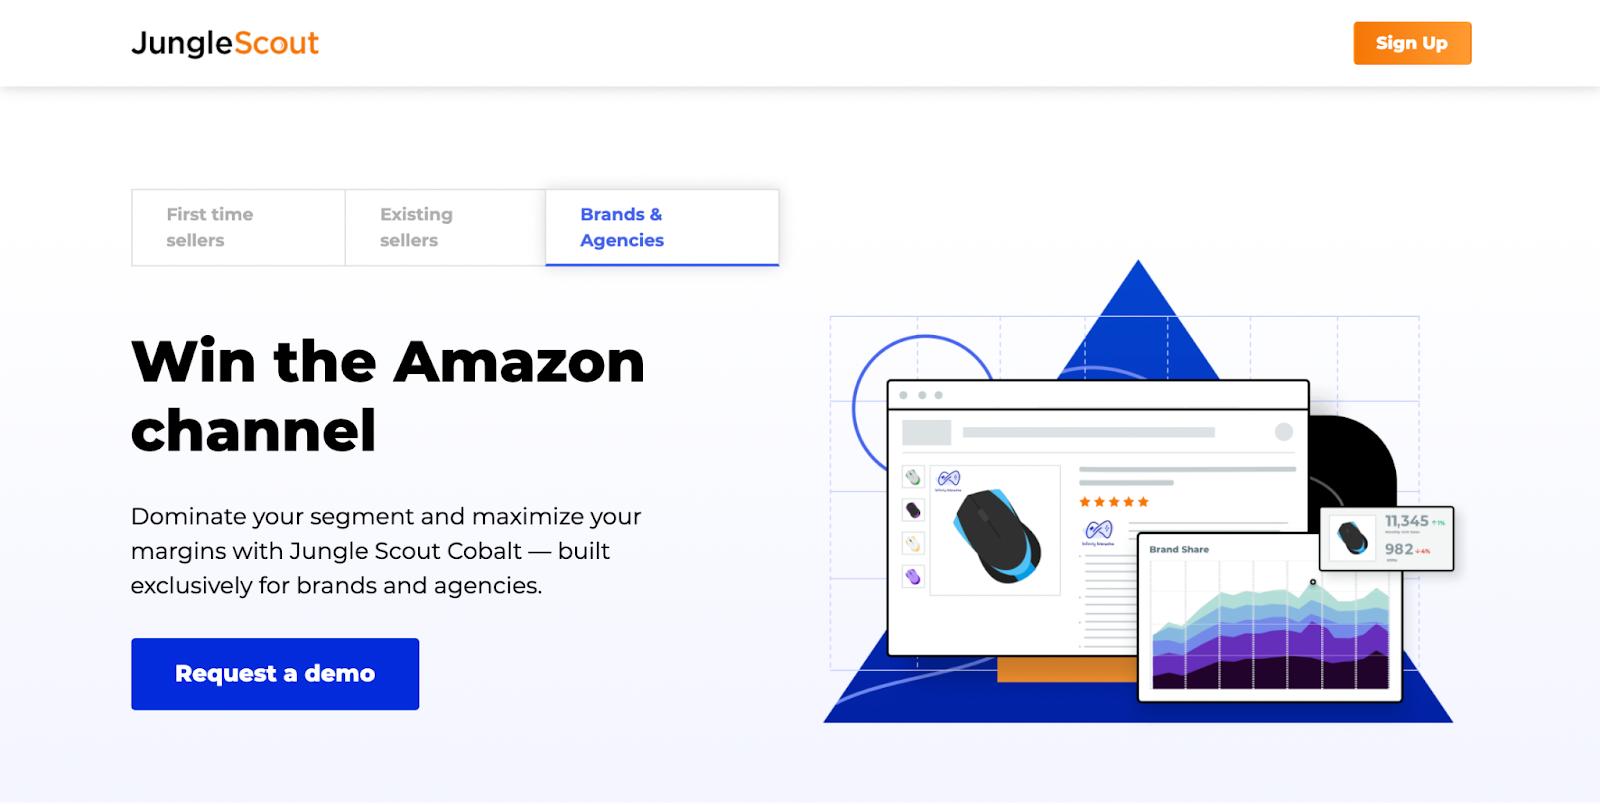 JungleScout for Brands & Agencies